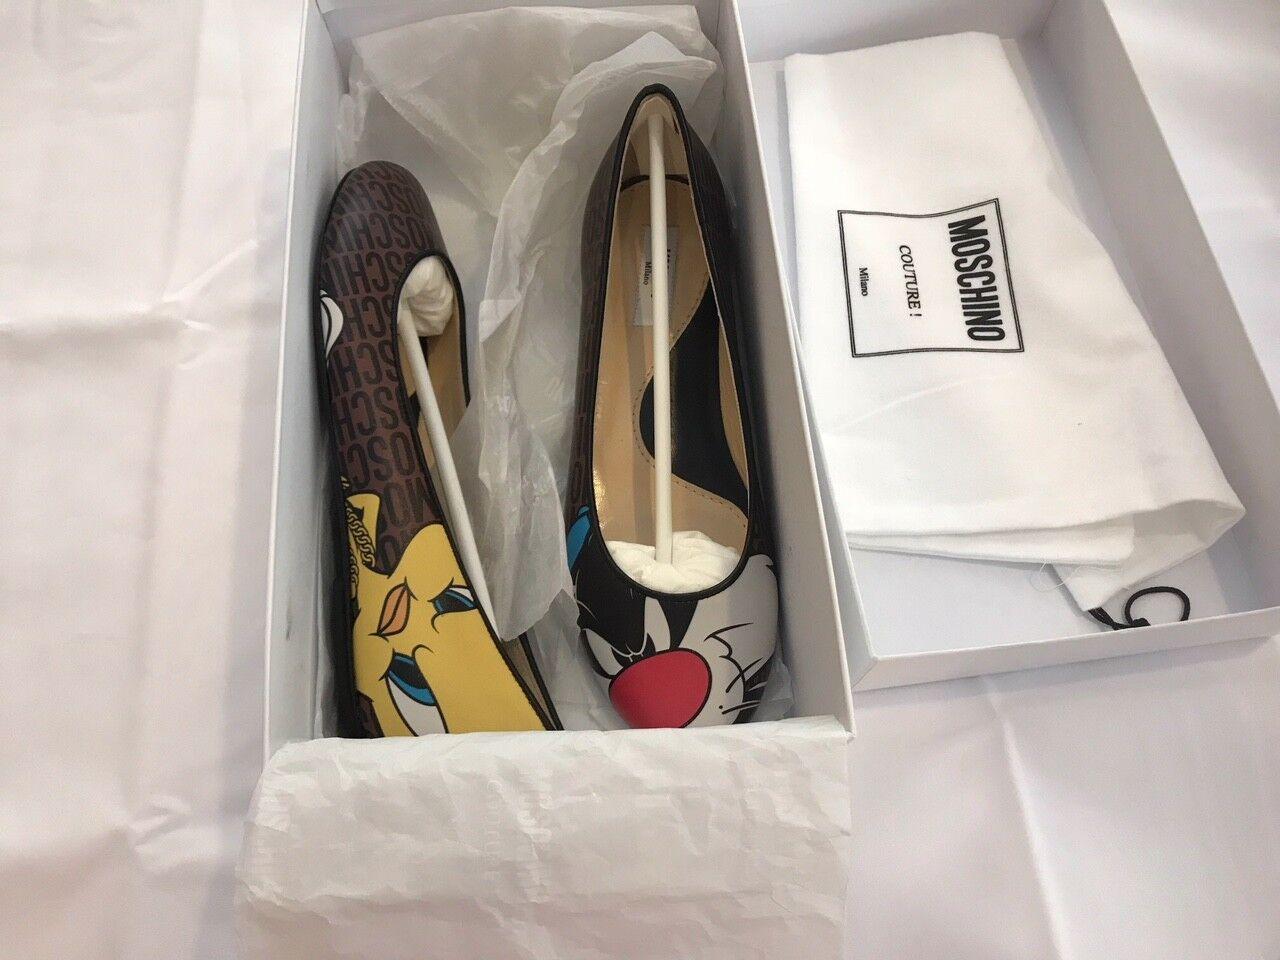 525 AW15 Moschino Couture Jeremy Scott Looney Tunes Tweety Flat Flat Tweety Ballet Scarpe 2c36c0